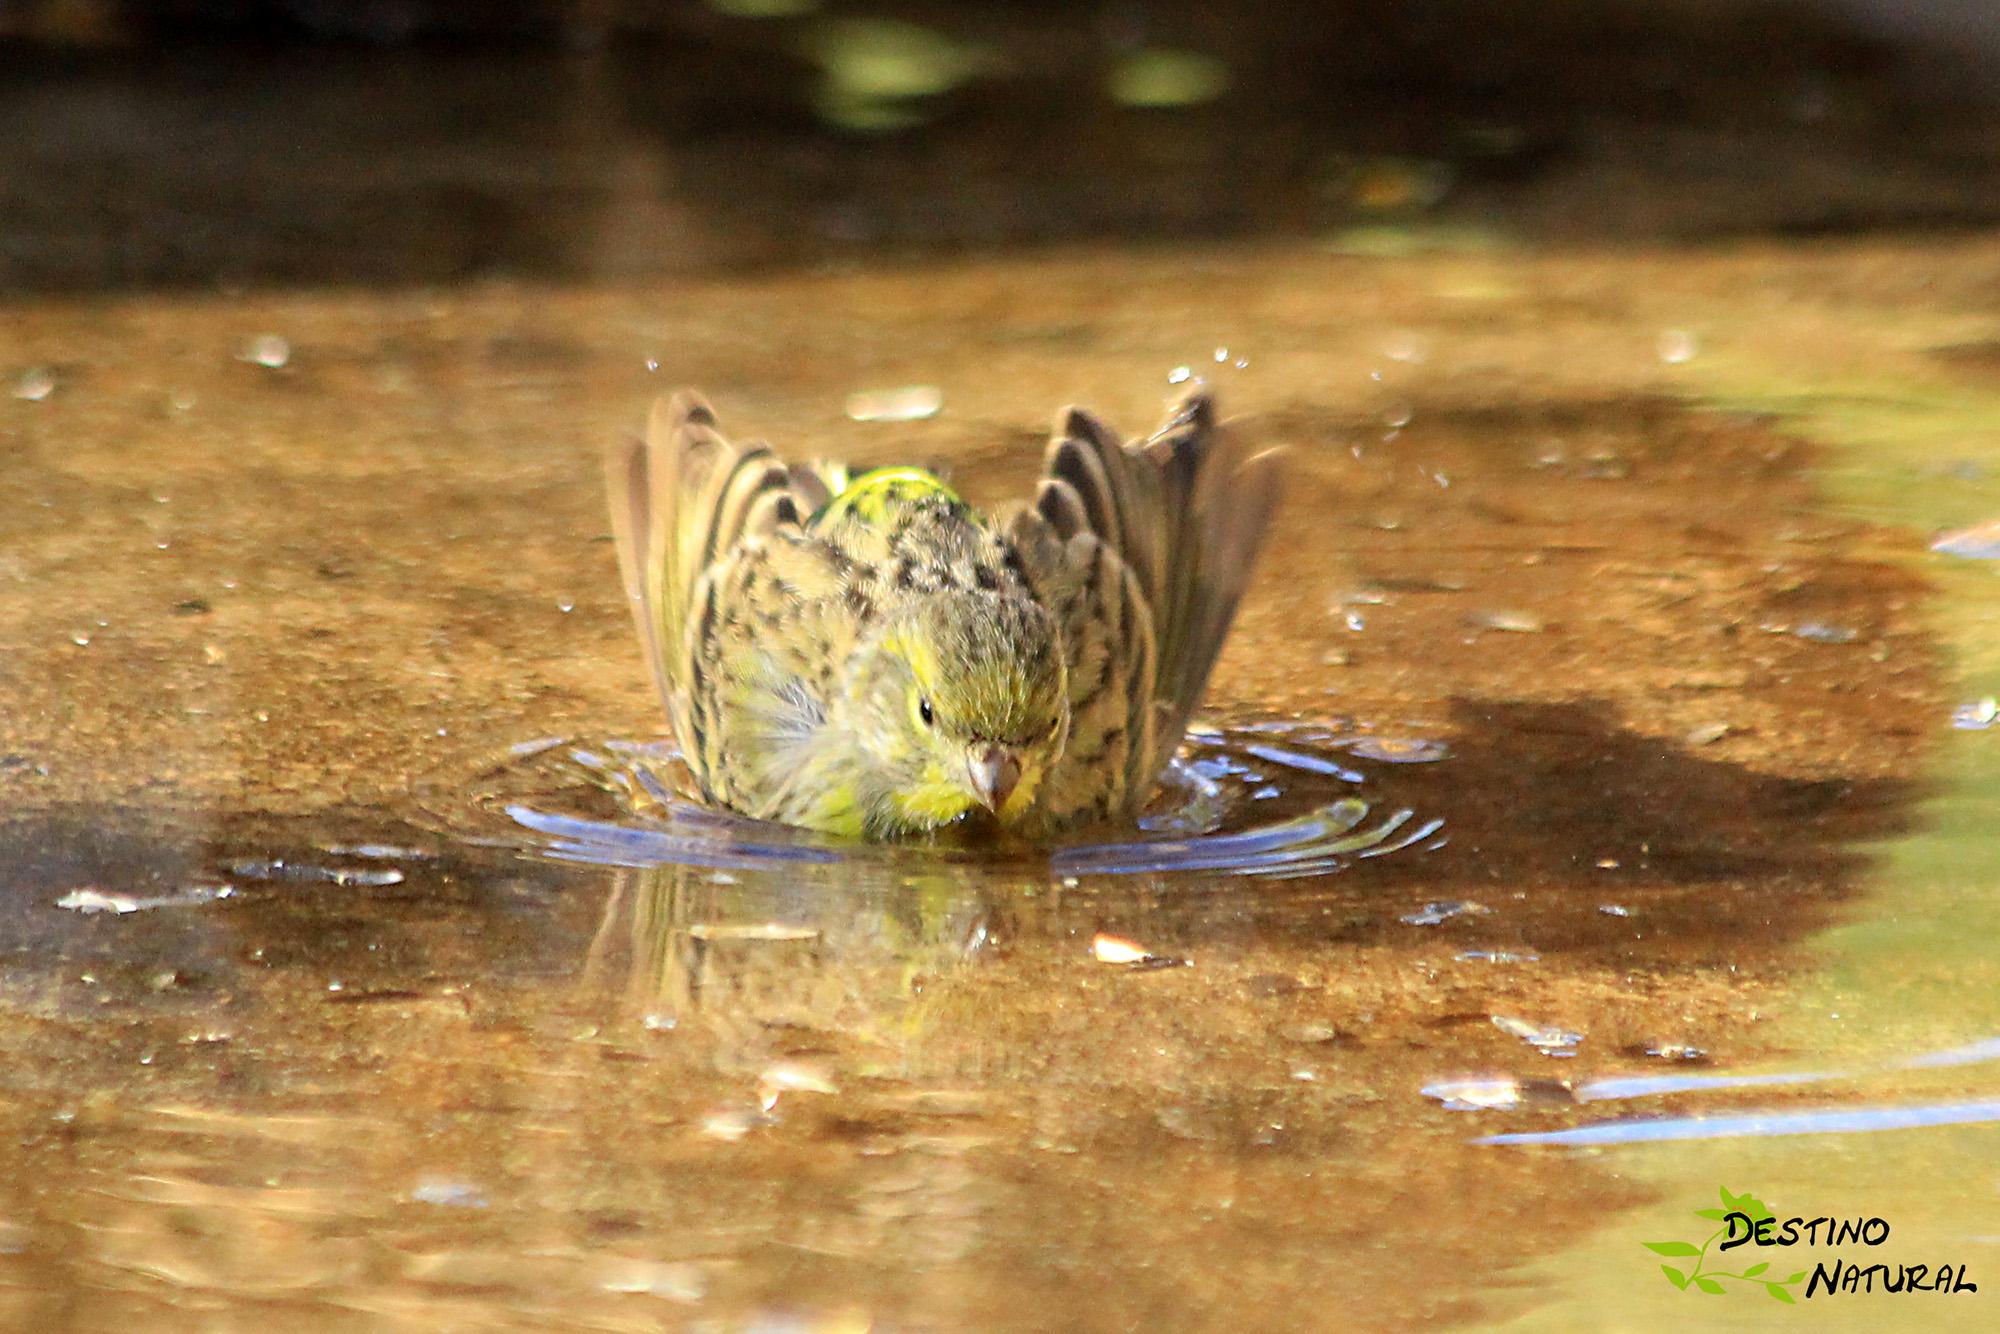 Verdecillo bañándose